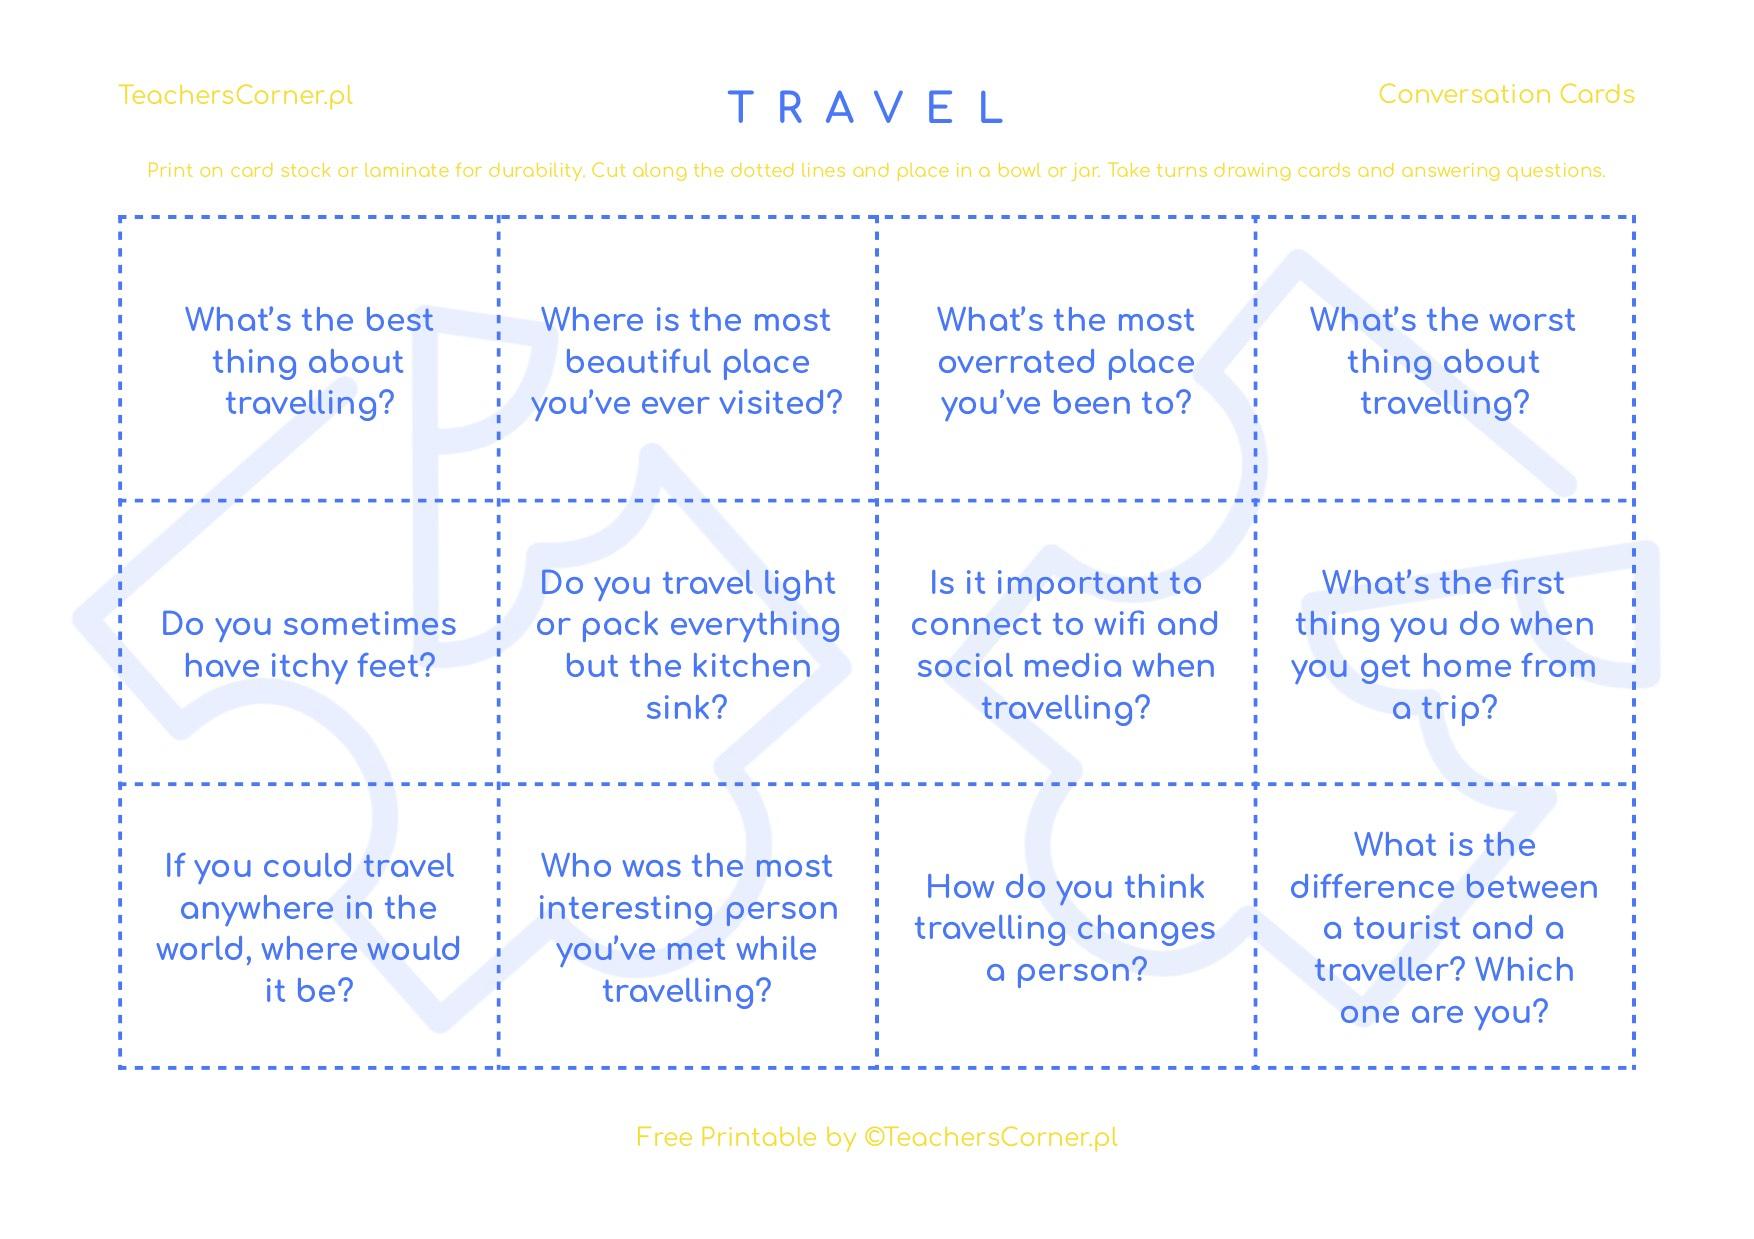 Conversation Cards - Travel Questions